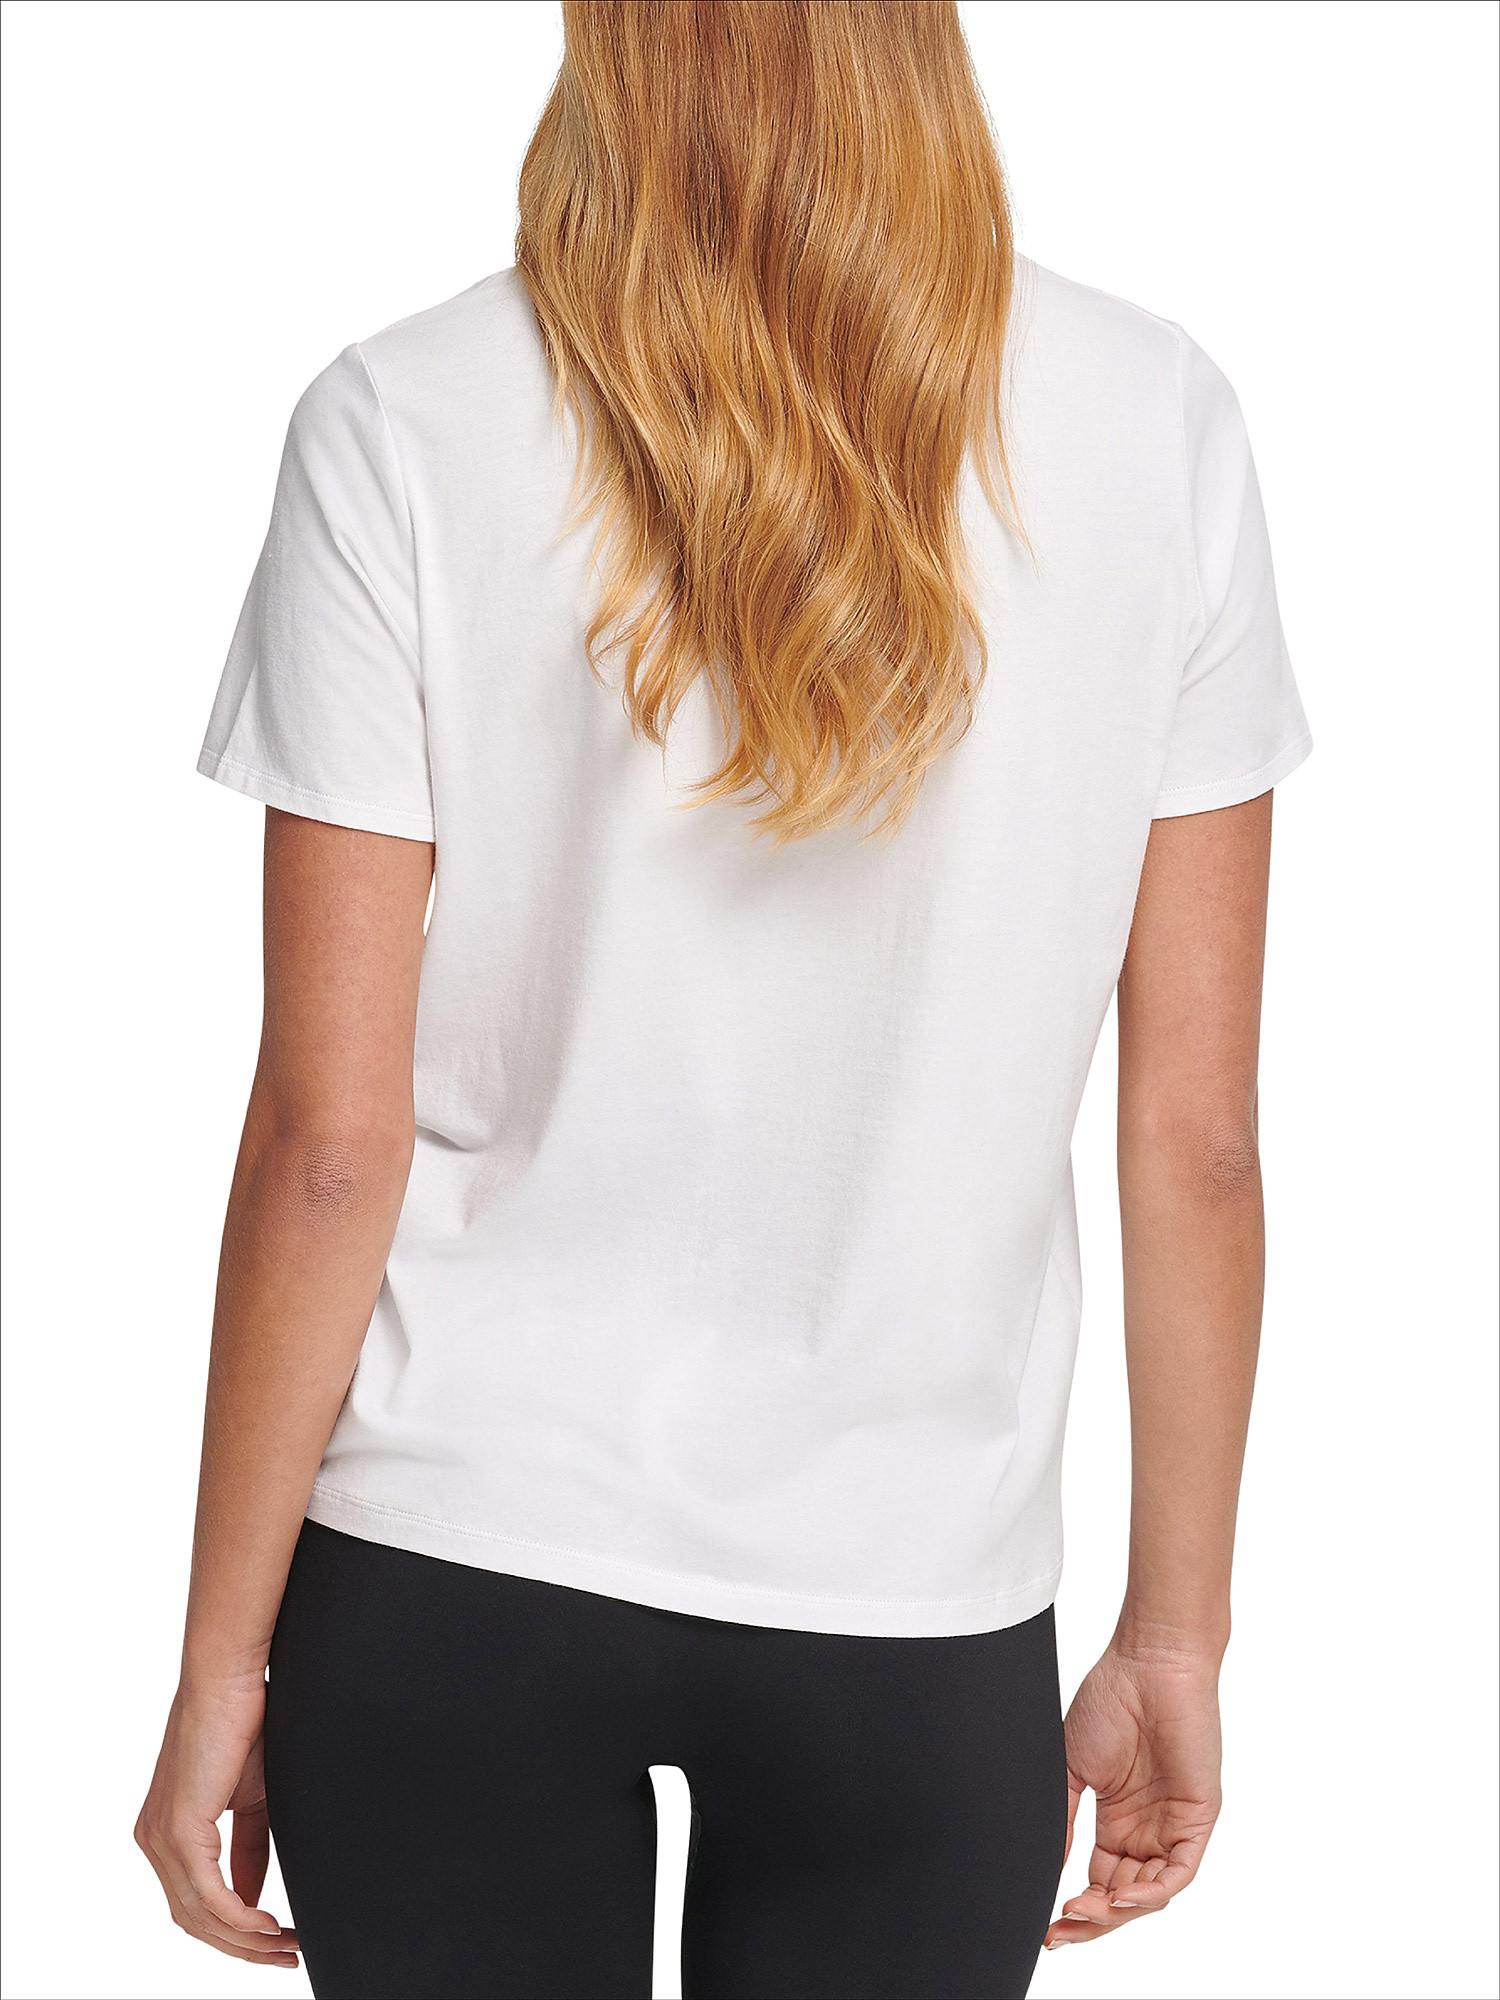 T-shirt track logo a maniche corte, Bianco, large image number 4